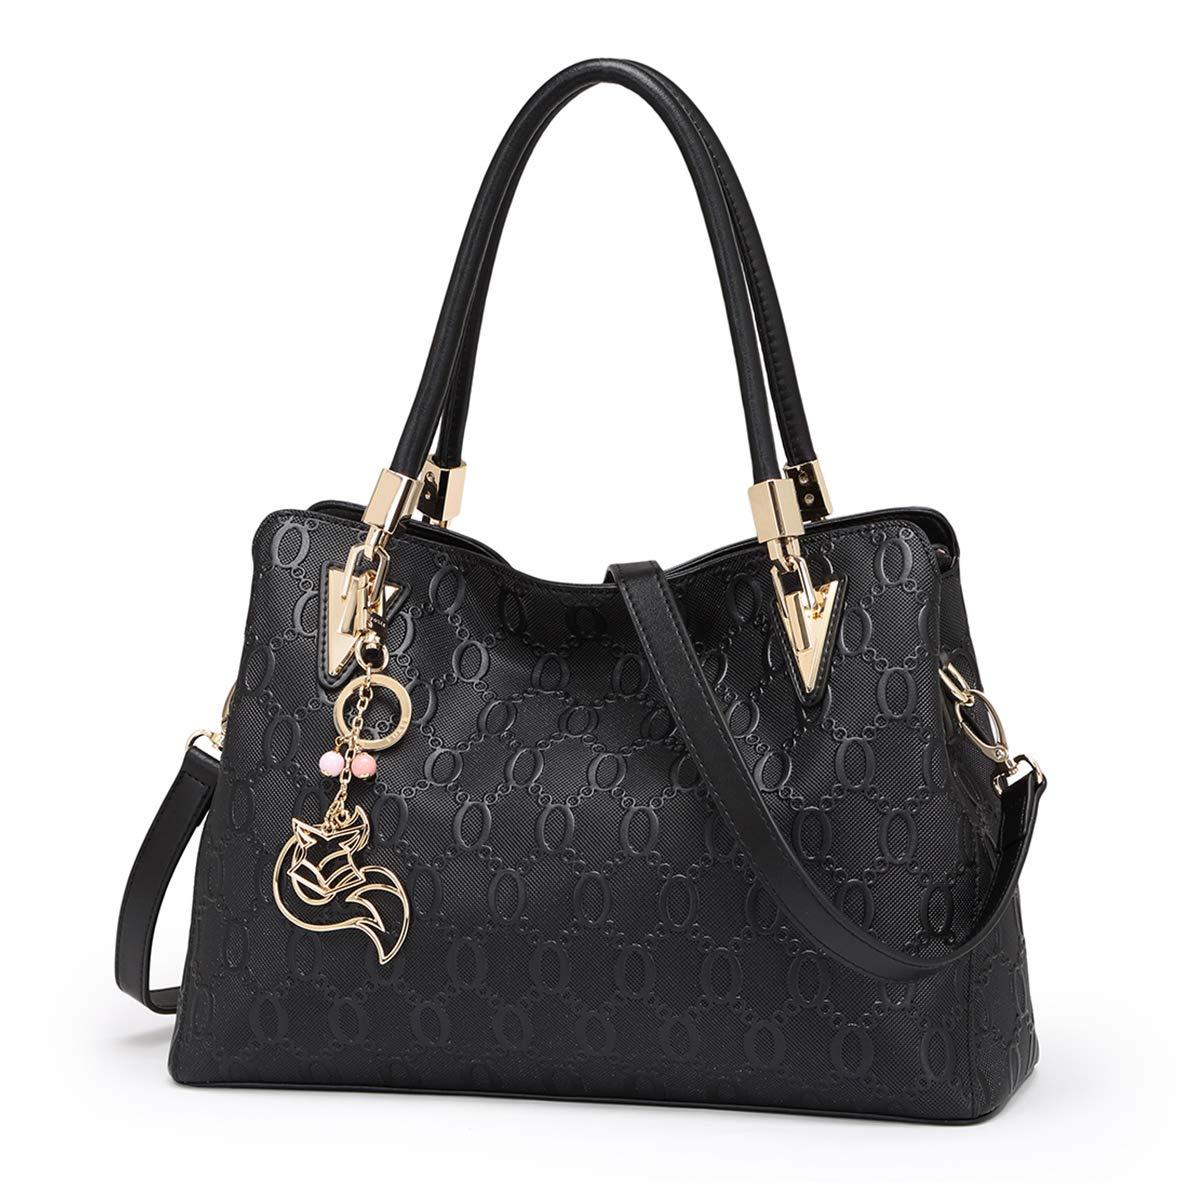 Genuine Leather Handbag for Women Ladies Top-handle Tote Crossbody Shoulder Bag